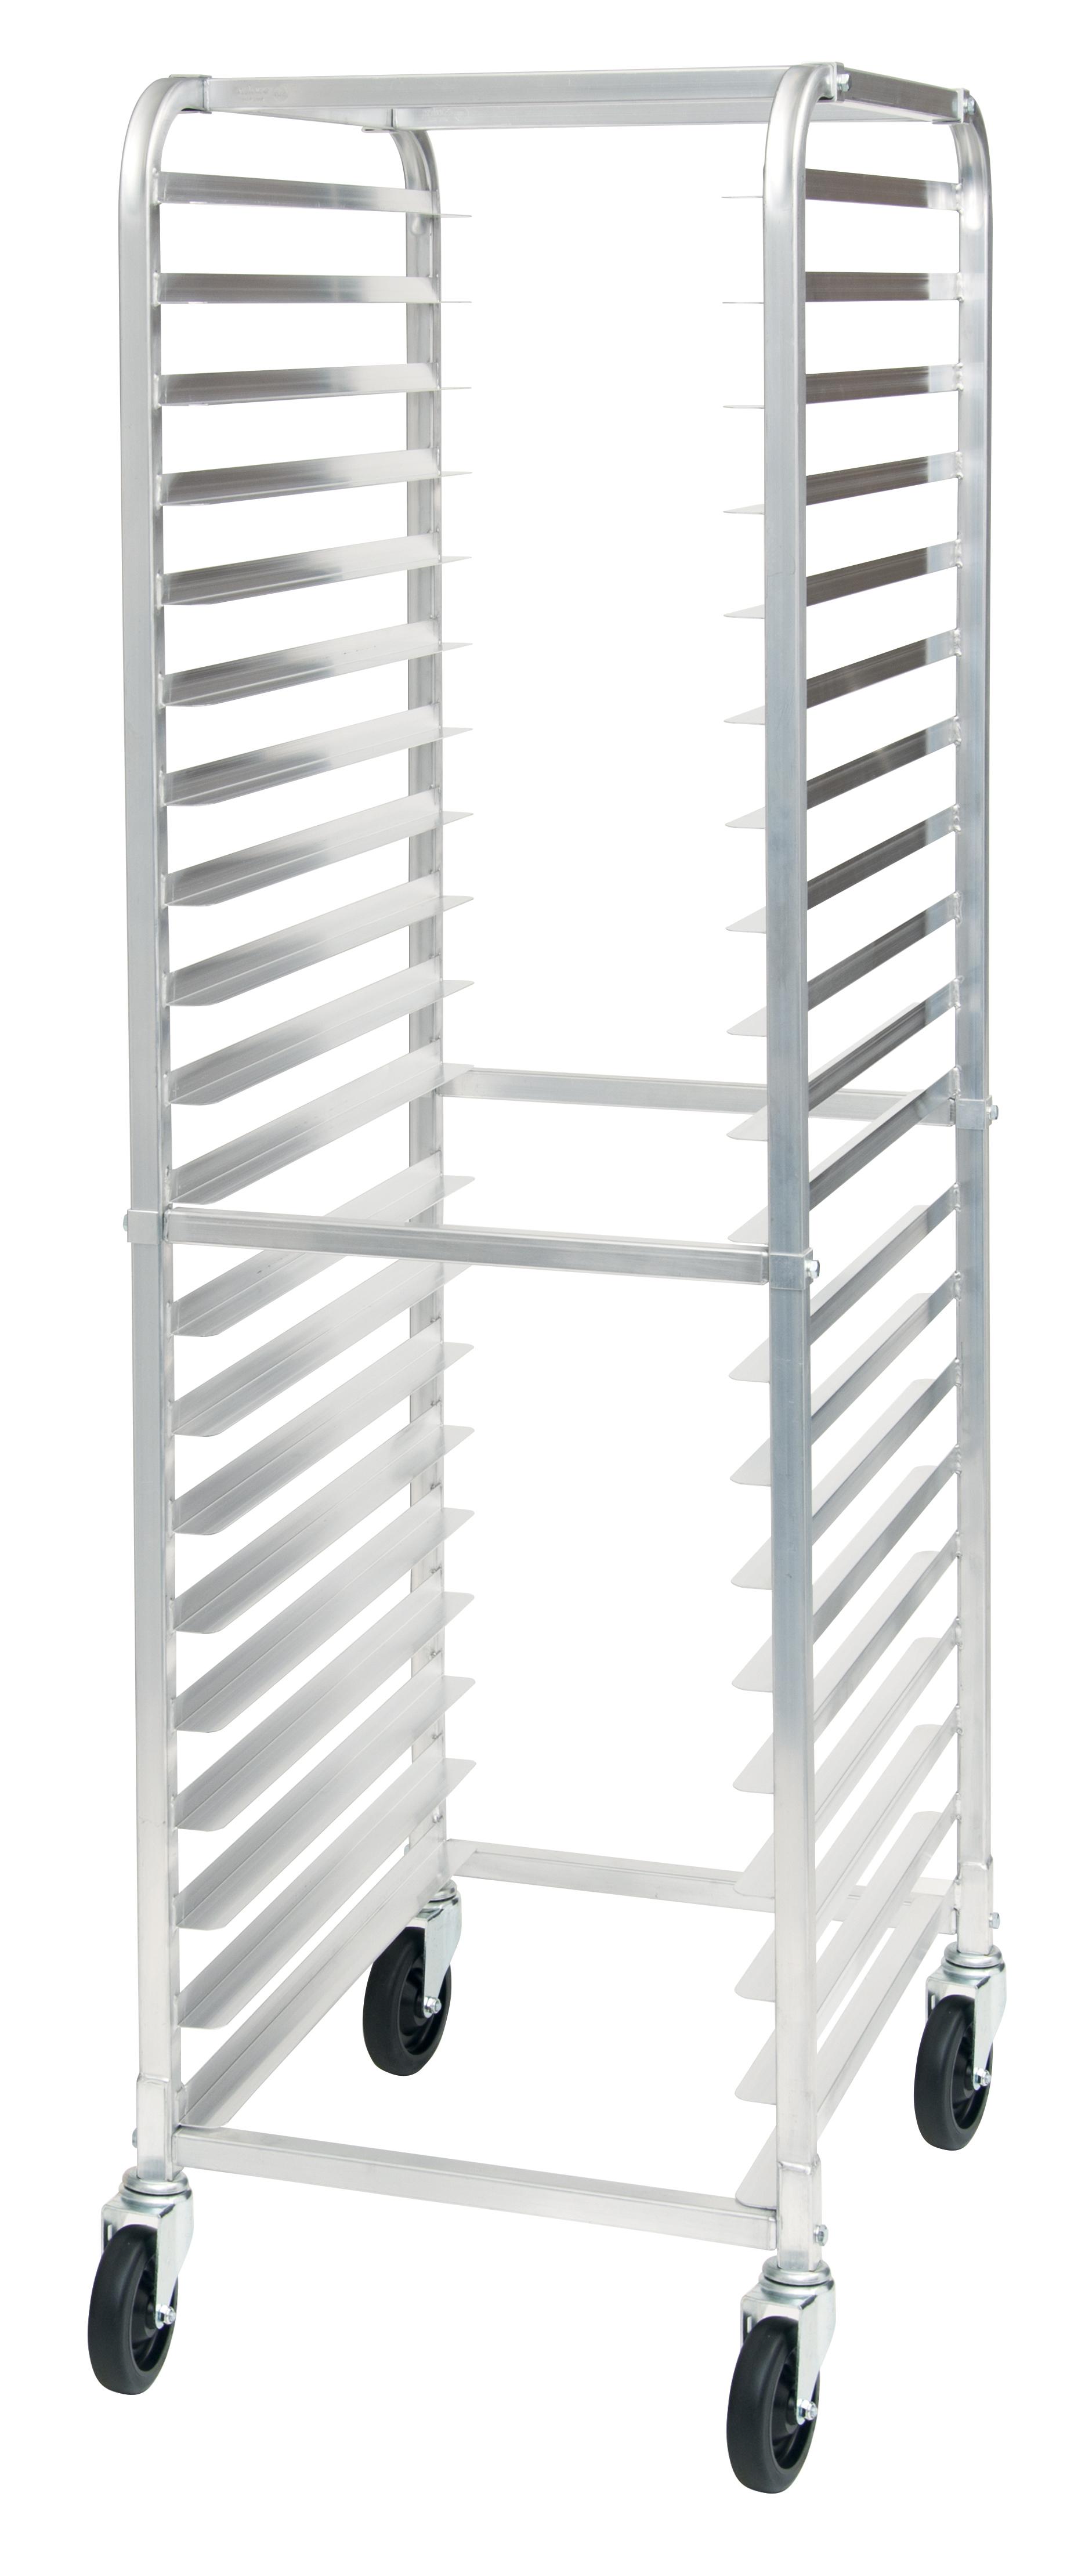 Winco AWZK-20 sheet pan racks